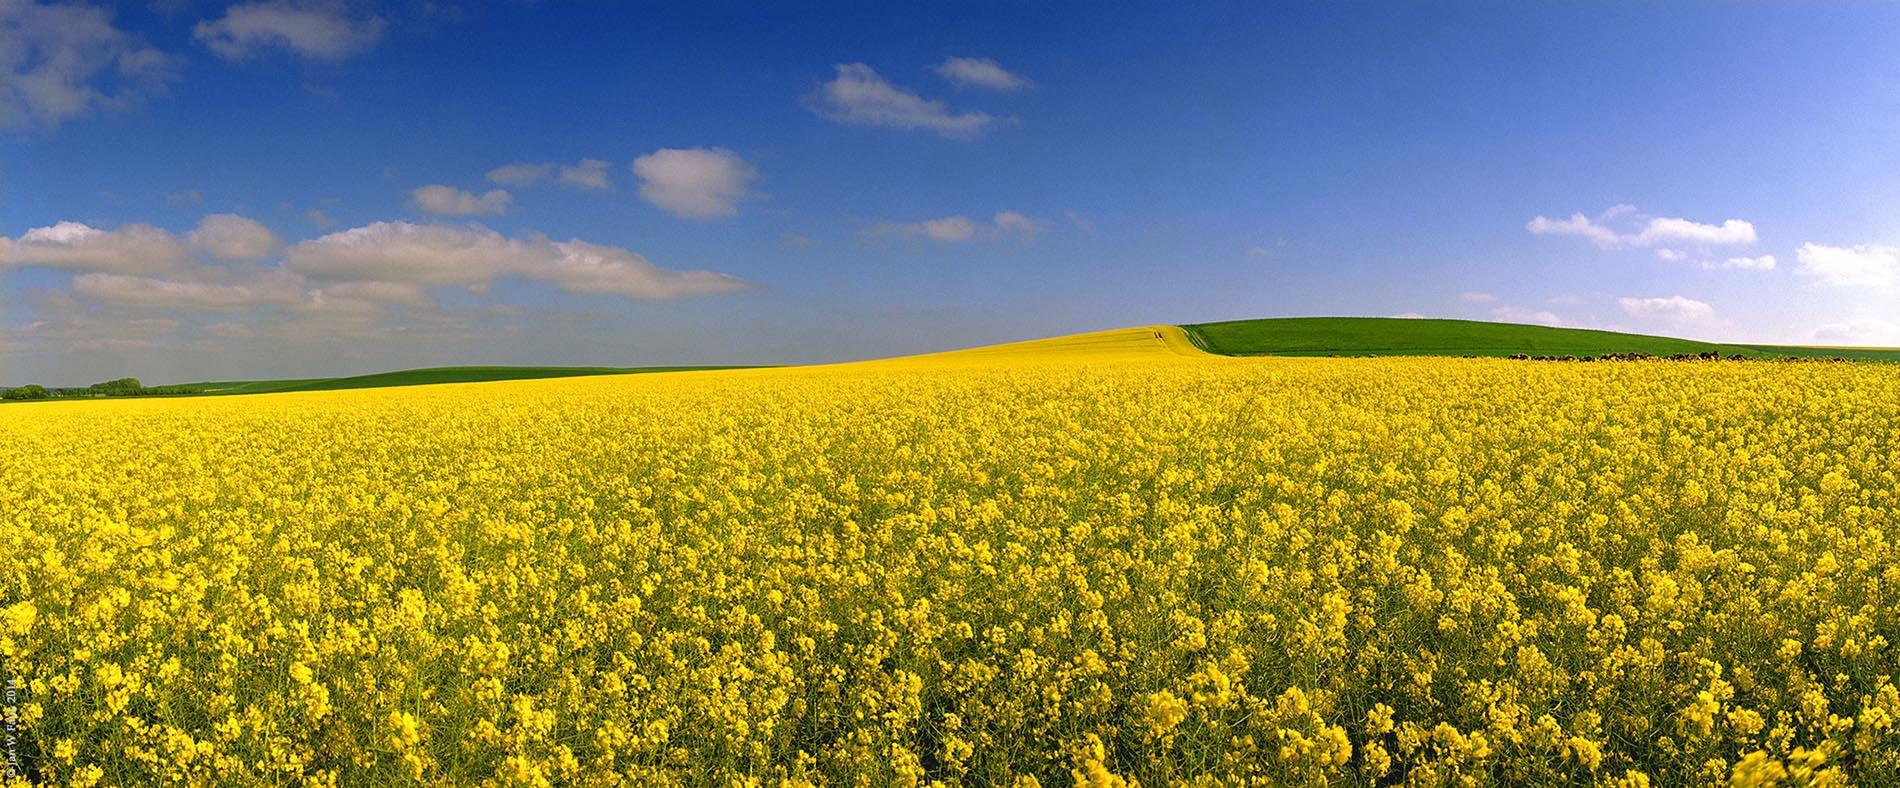 Rapeseed Field, Avebury